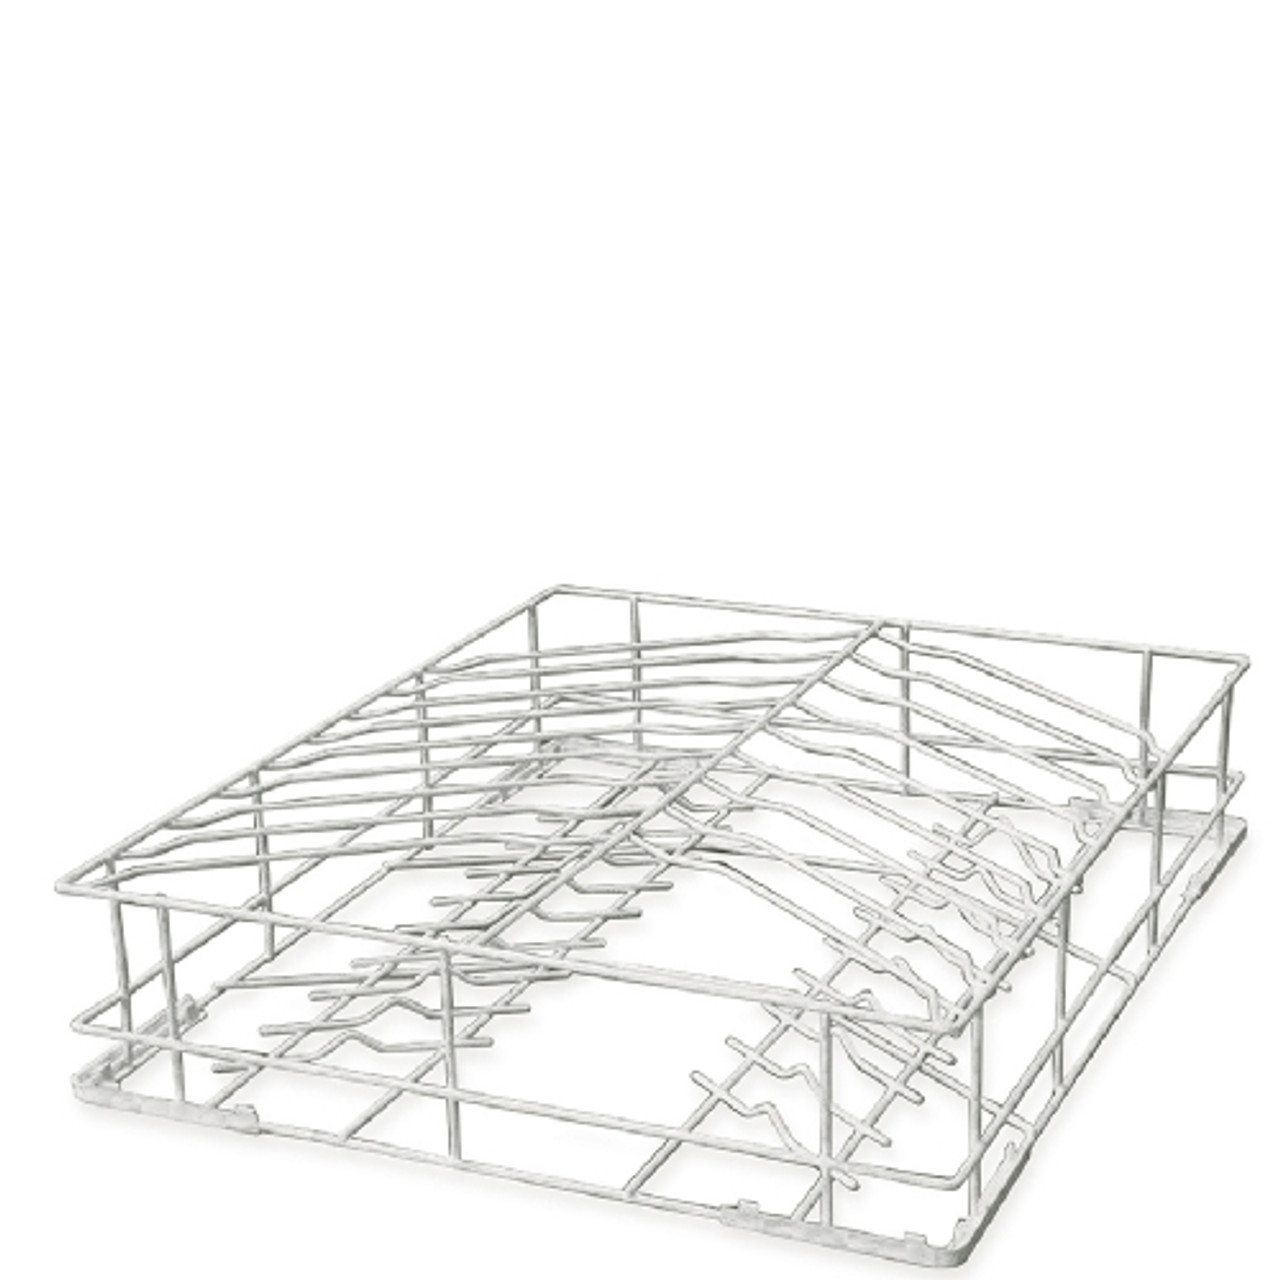 Smeg WB60D02 600x500x125mm 18 Plate Rilson-coated Wire Basket for Smeg Dishwashers - max 320mm Diameter